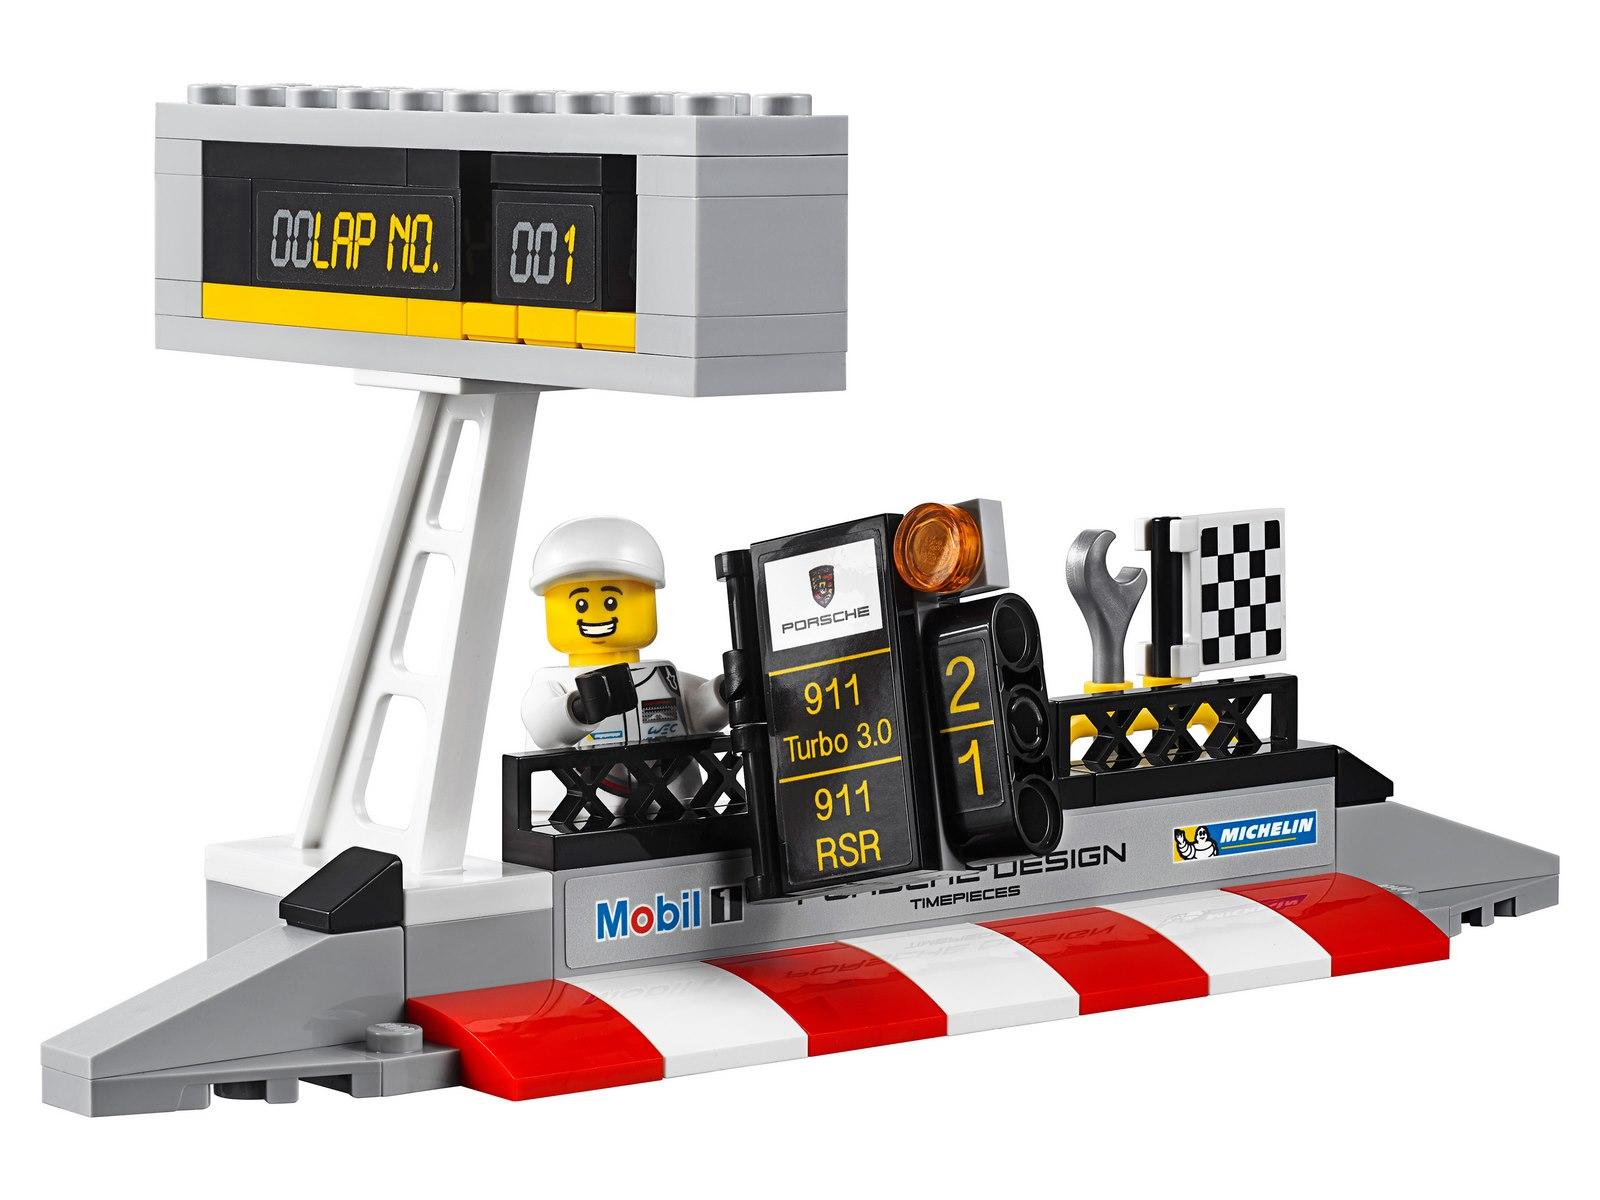 Конструктор Lp Racings «Porsche 911 RSR и 911 Turbo 3.0» 28018 (Speed Champions 75888) 438 деталей